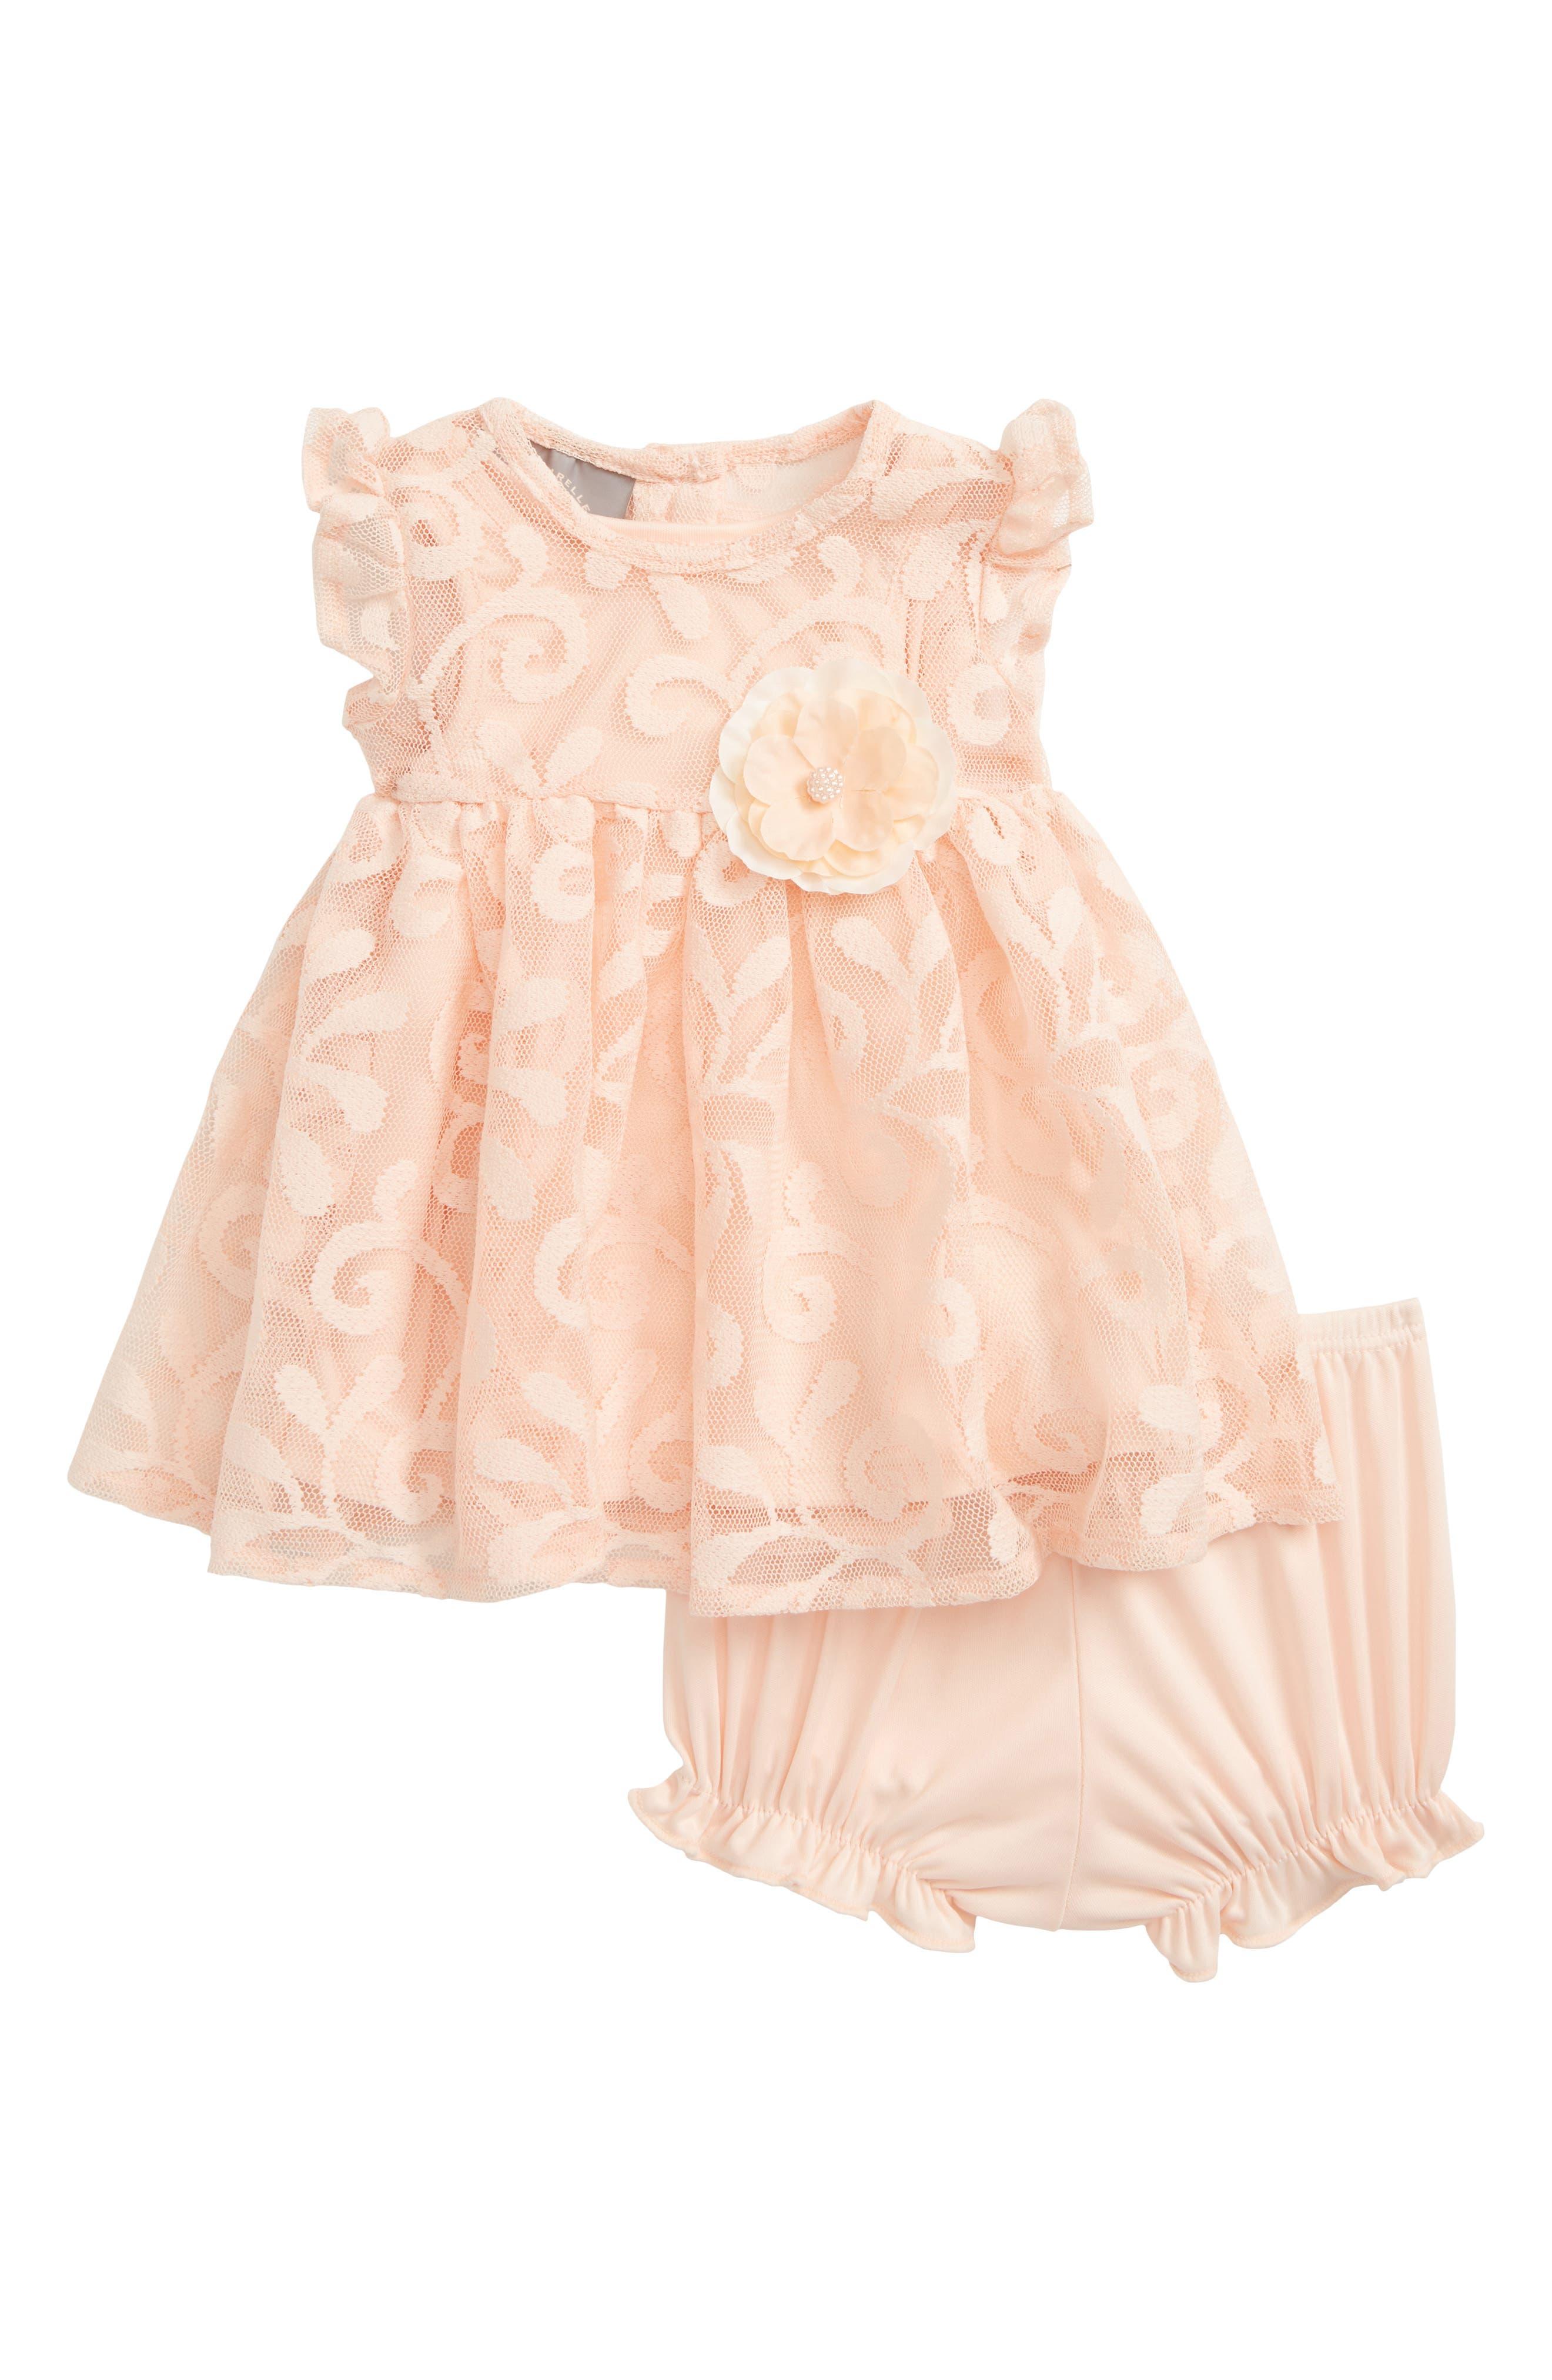 Lace Dress,                             Main thumbnail 1, color,                             950